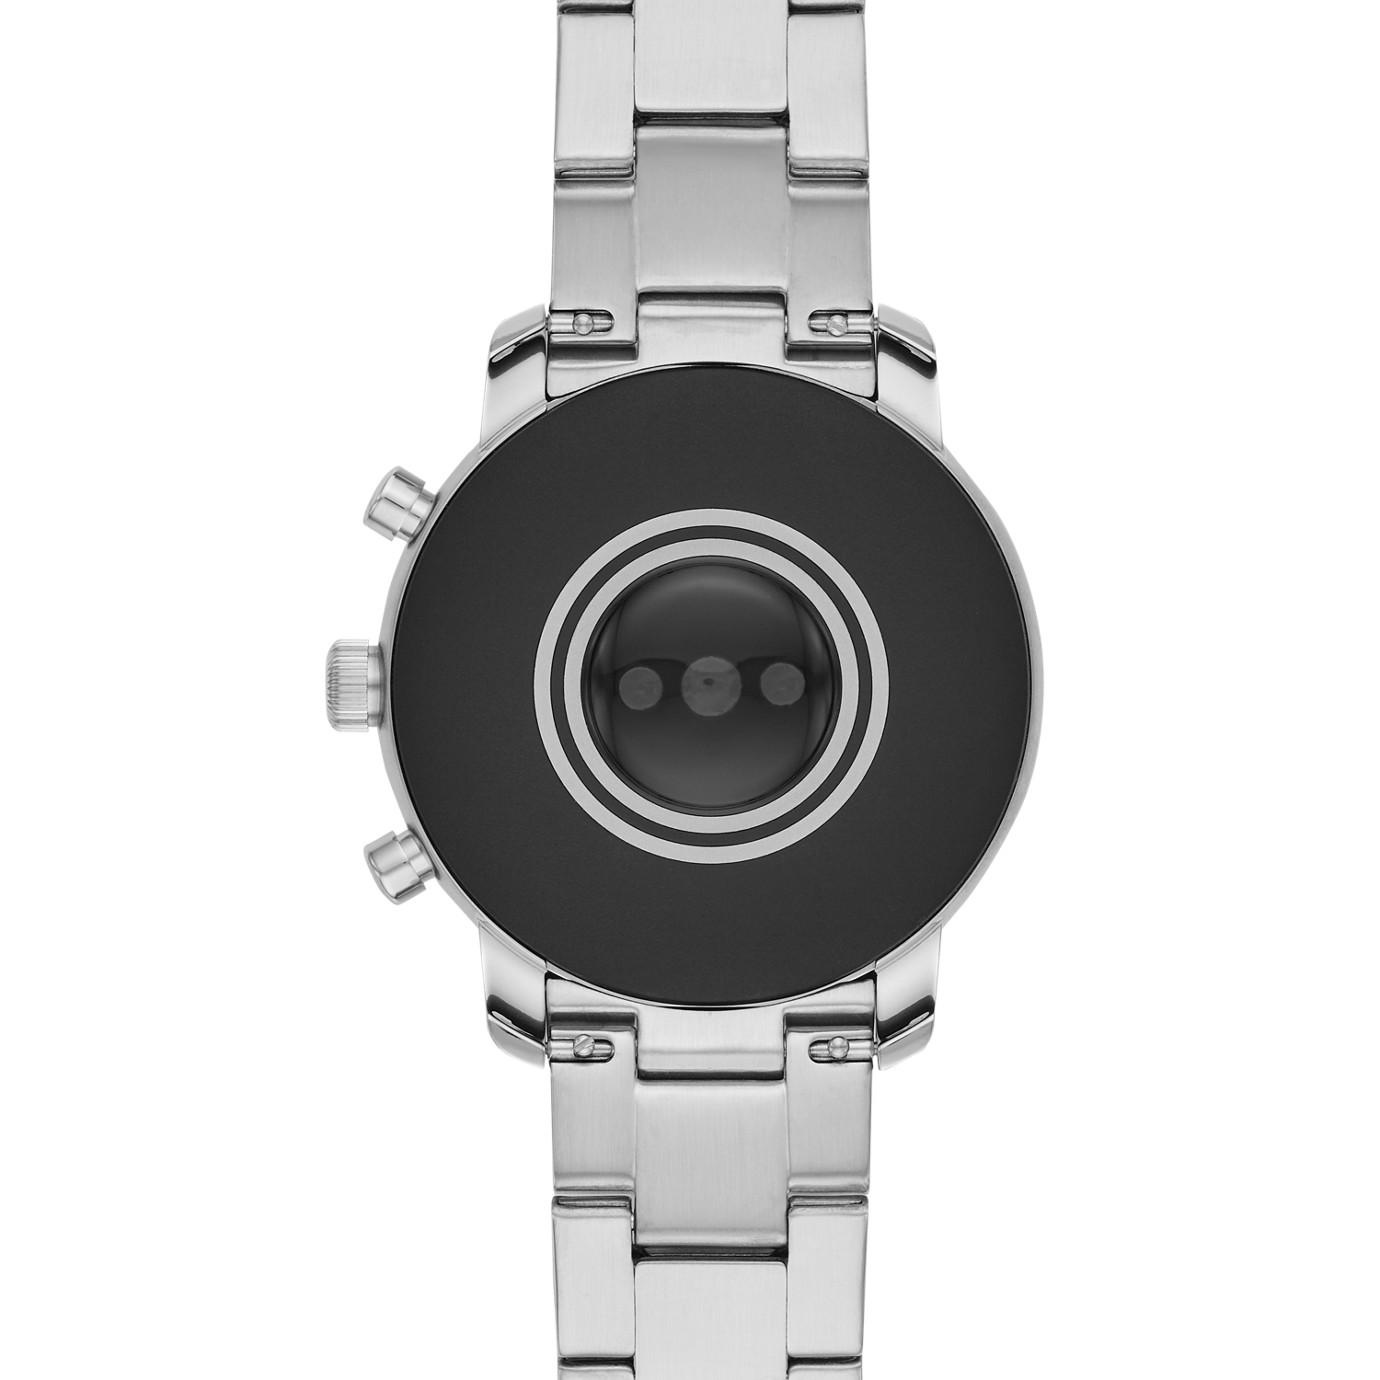 Gen 4 Smartwatch -  Explorist HR Stainless Steel